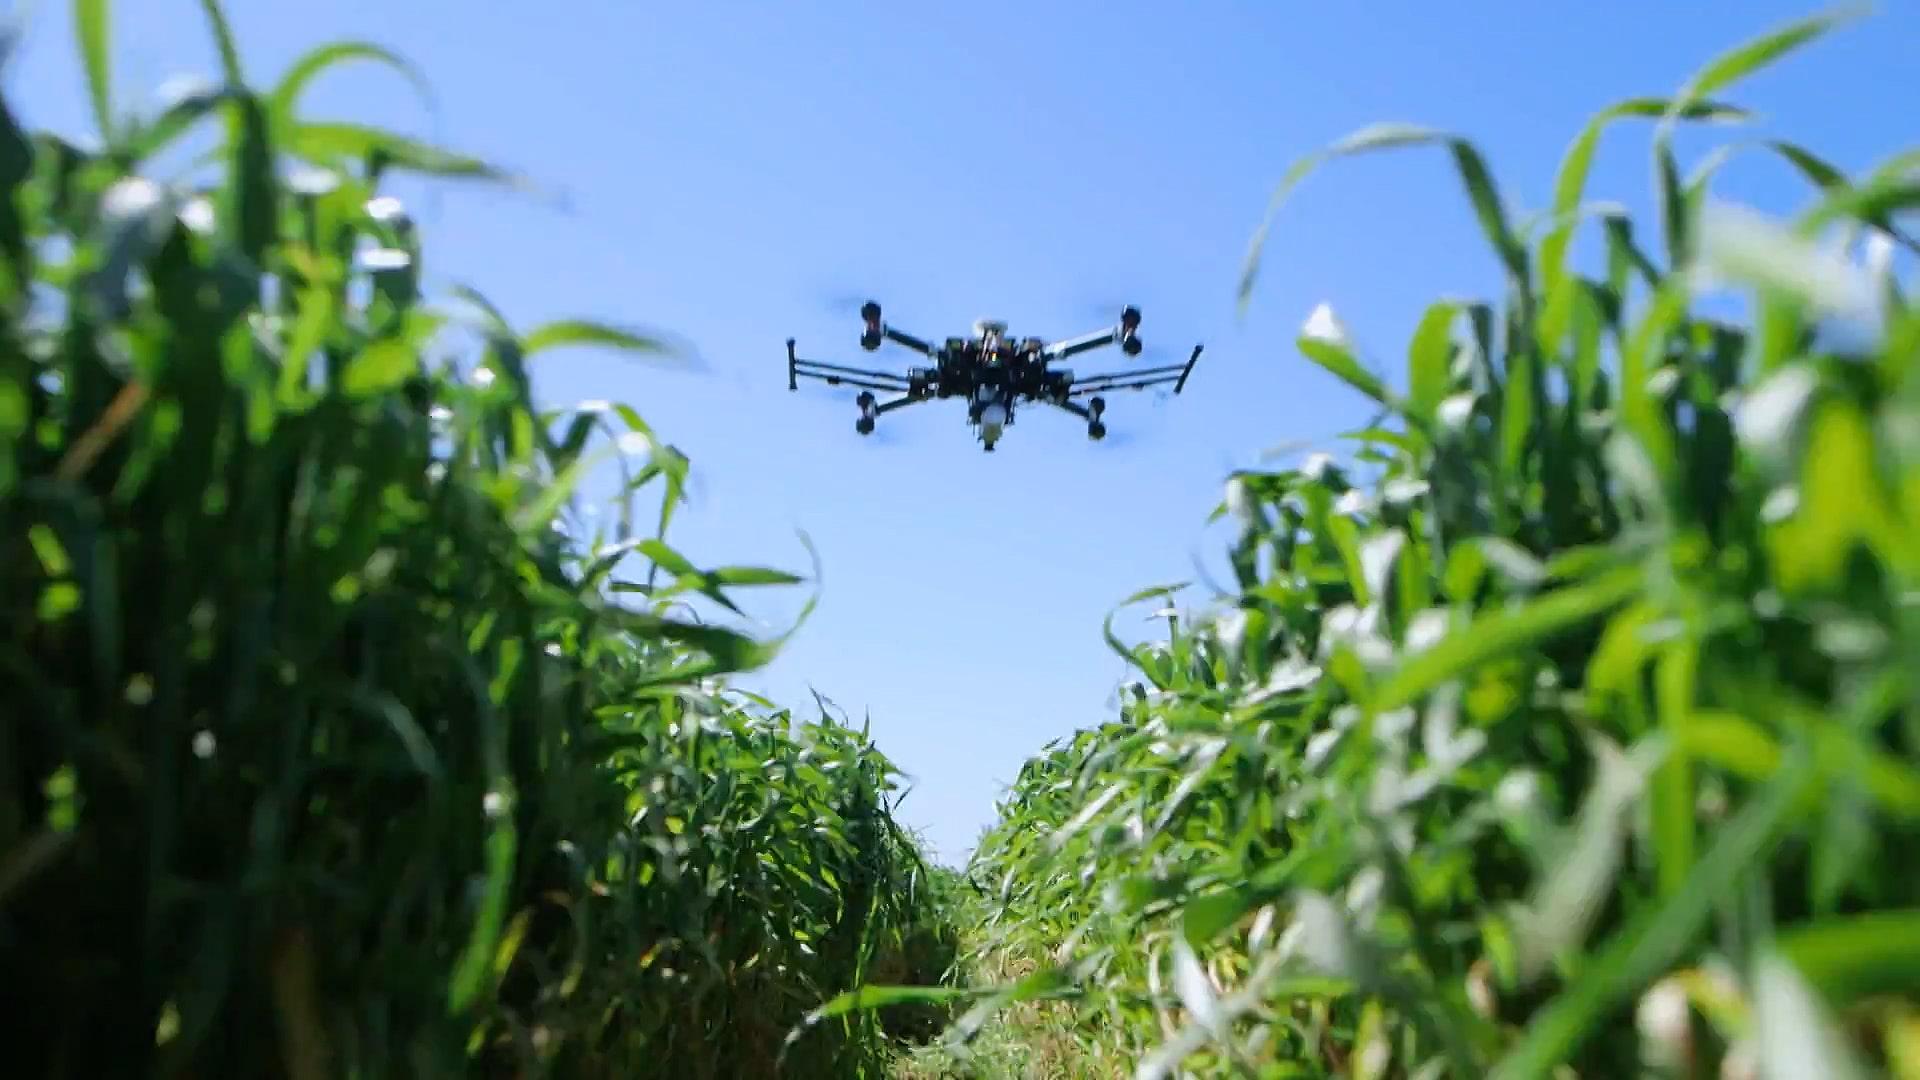 Mahsul kontrolü yapan bir dron